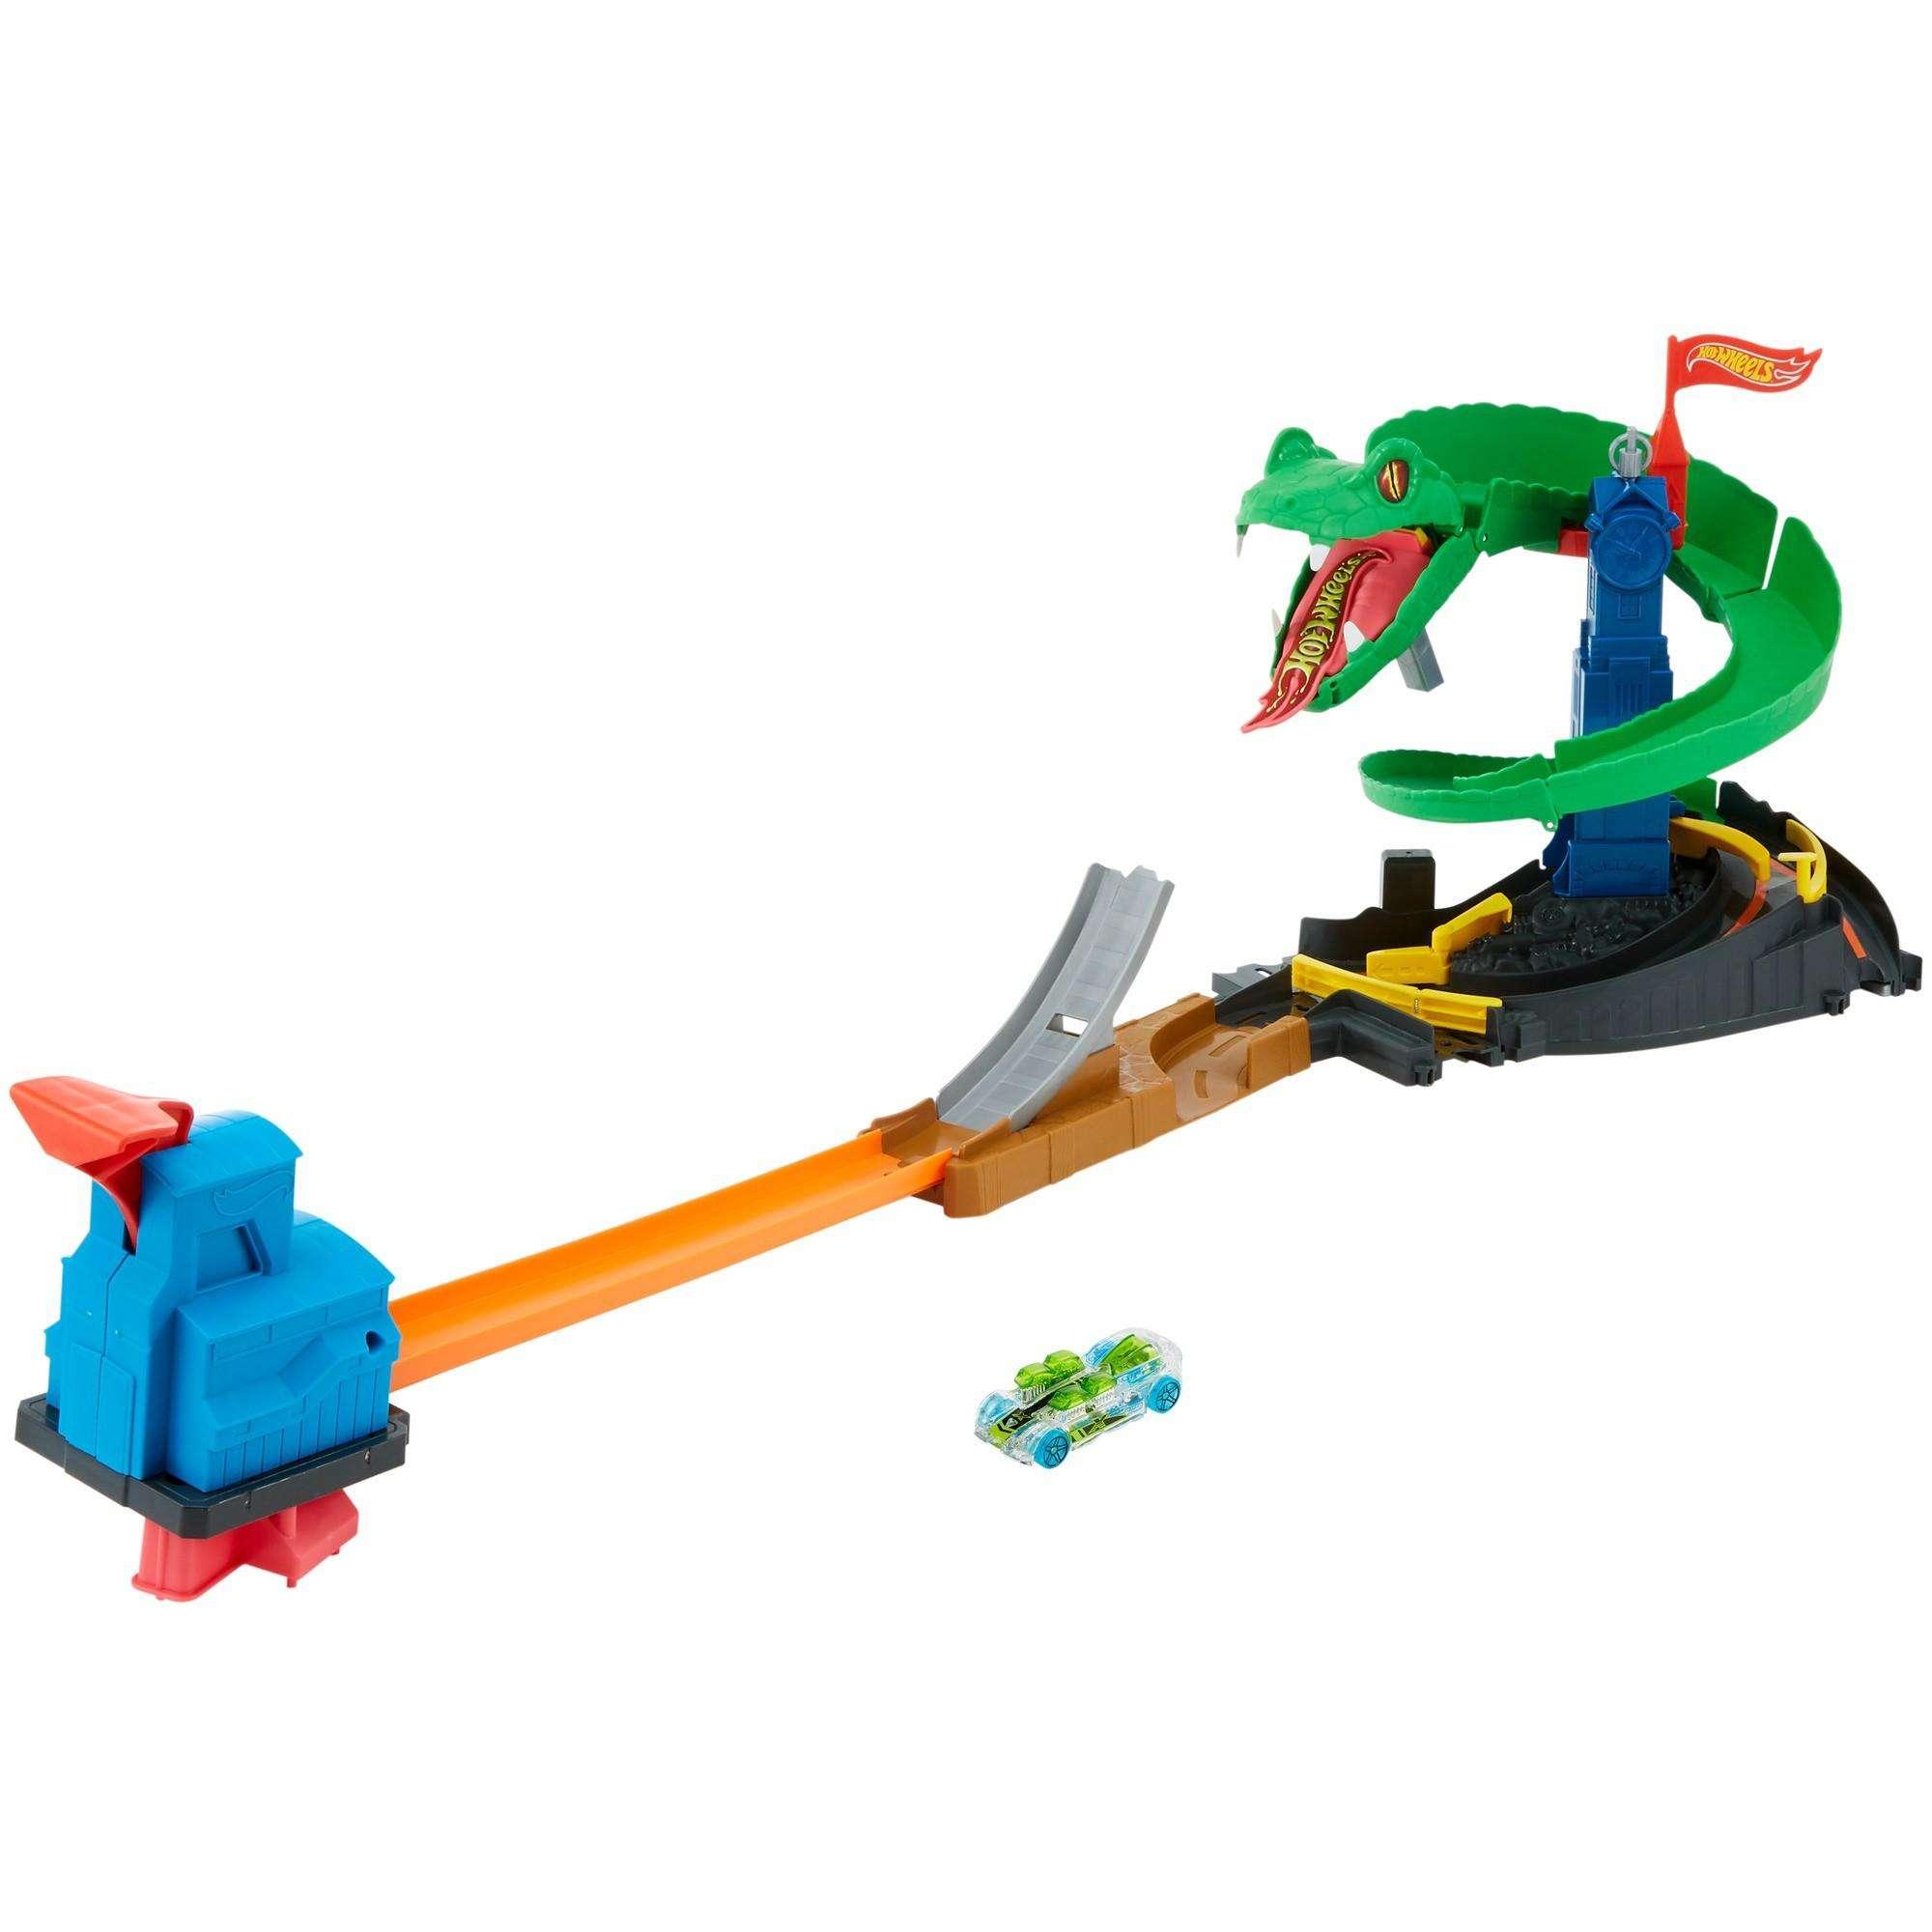 Hot Wheels City Cobra Crush Play Set by Mattel